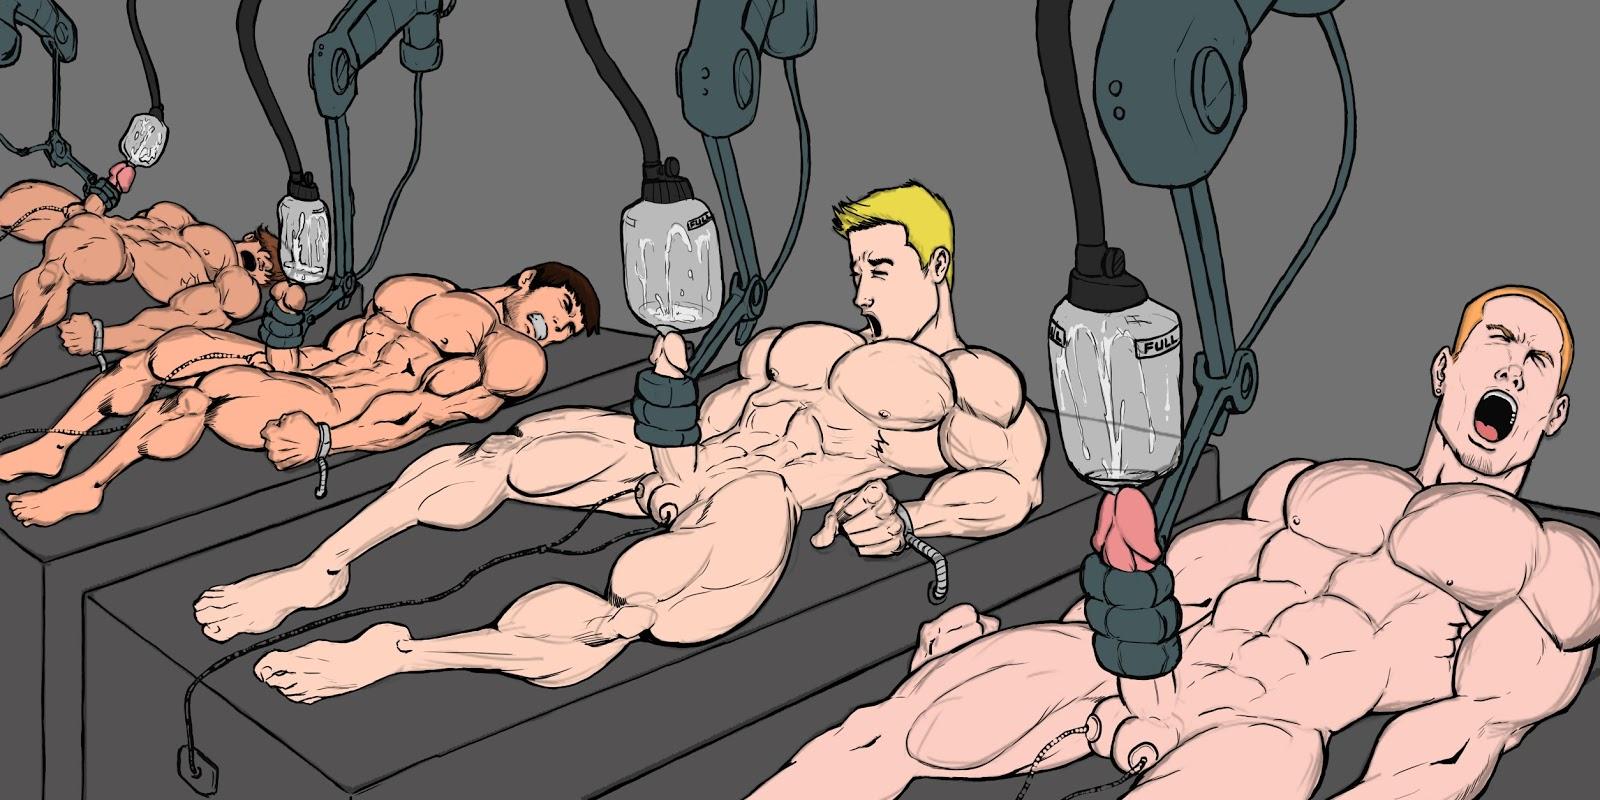 cartoon tit milking machine